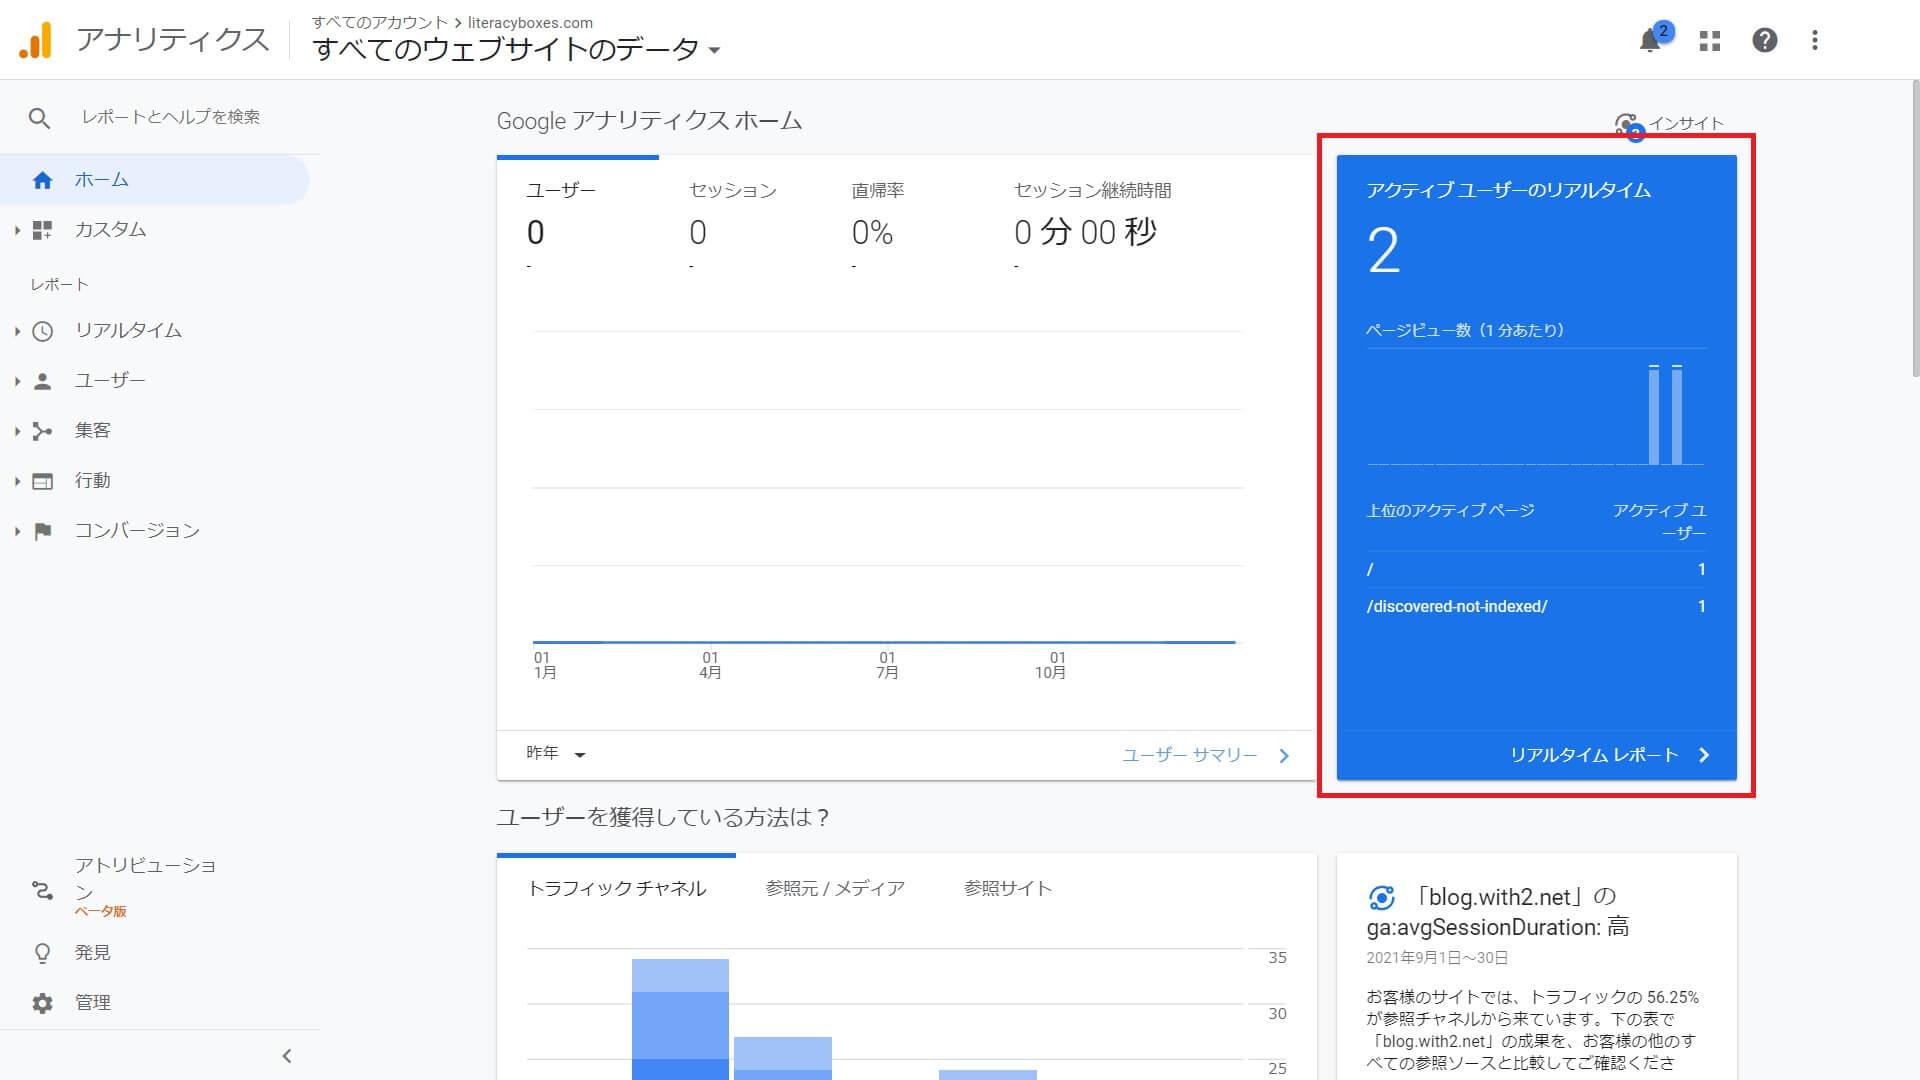 Googleアナリティクス-ユニバーサルアナリティクスリアルタイムレポート